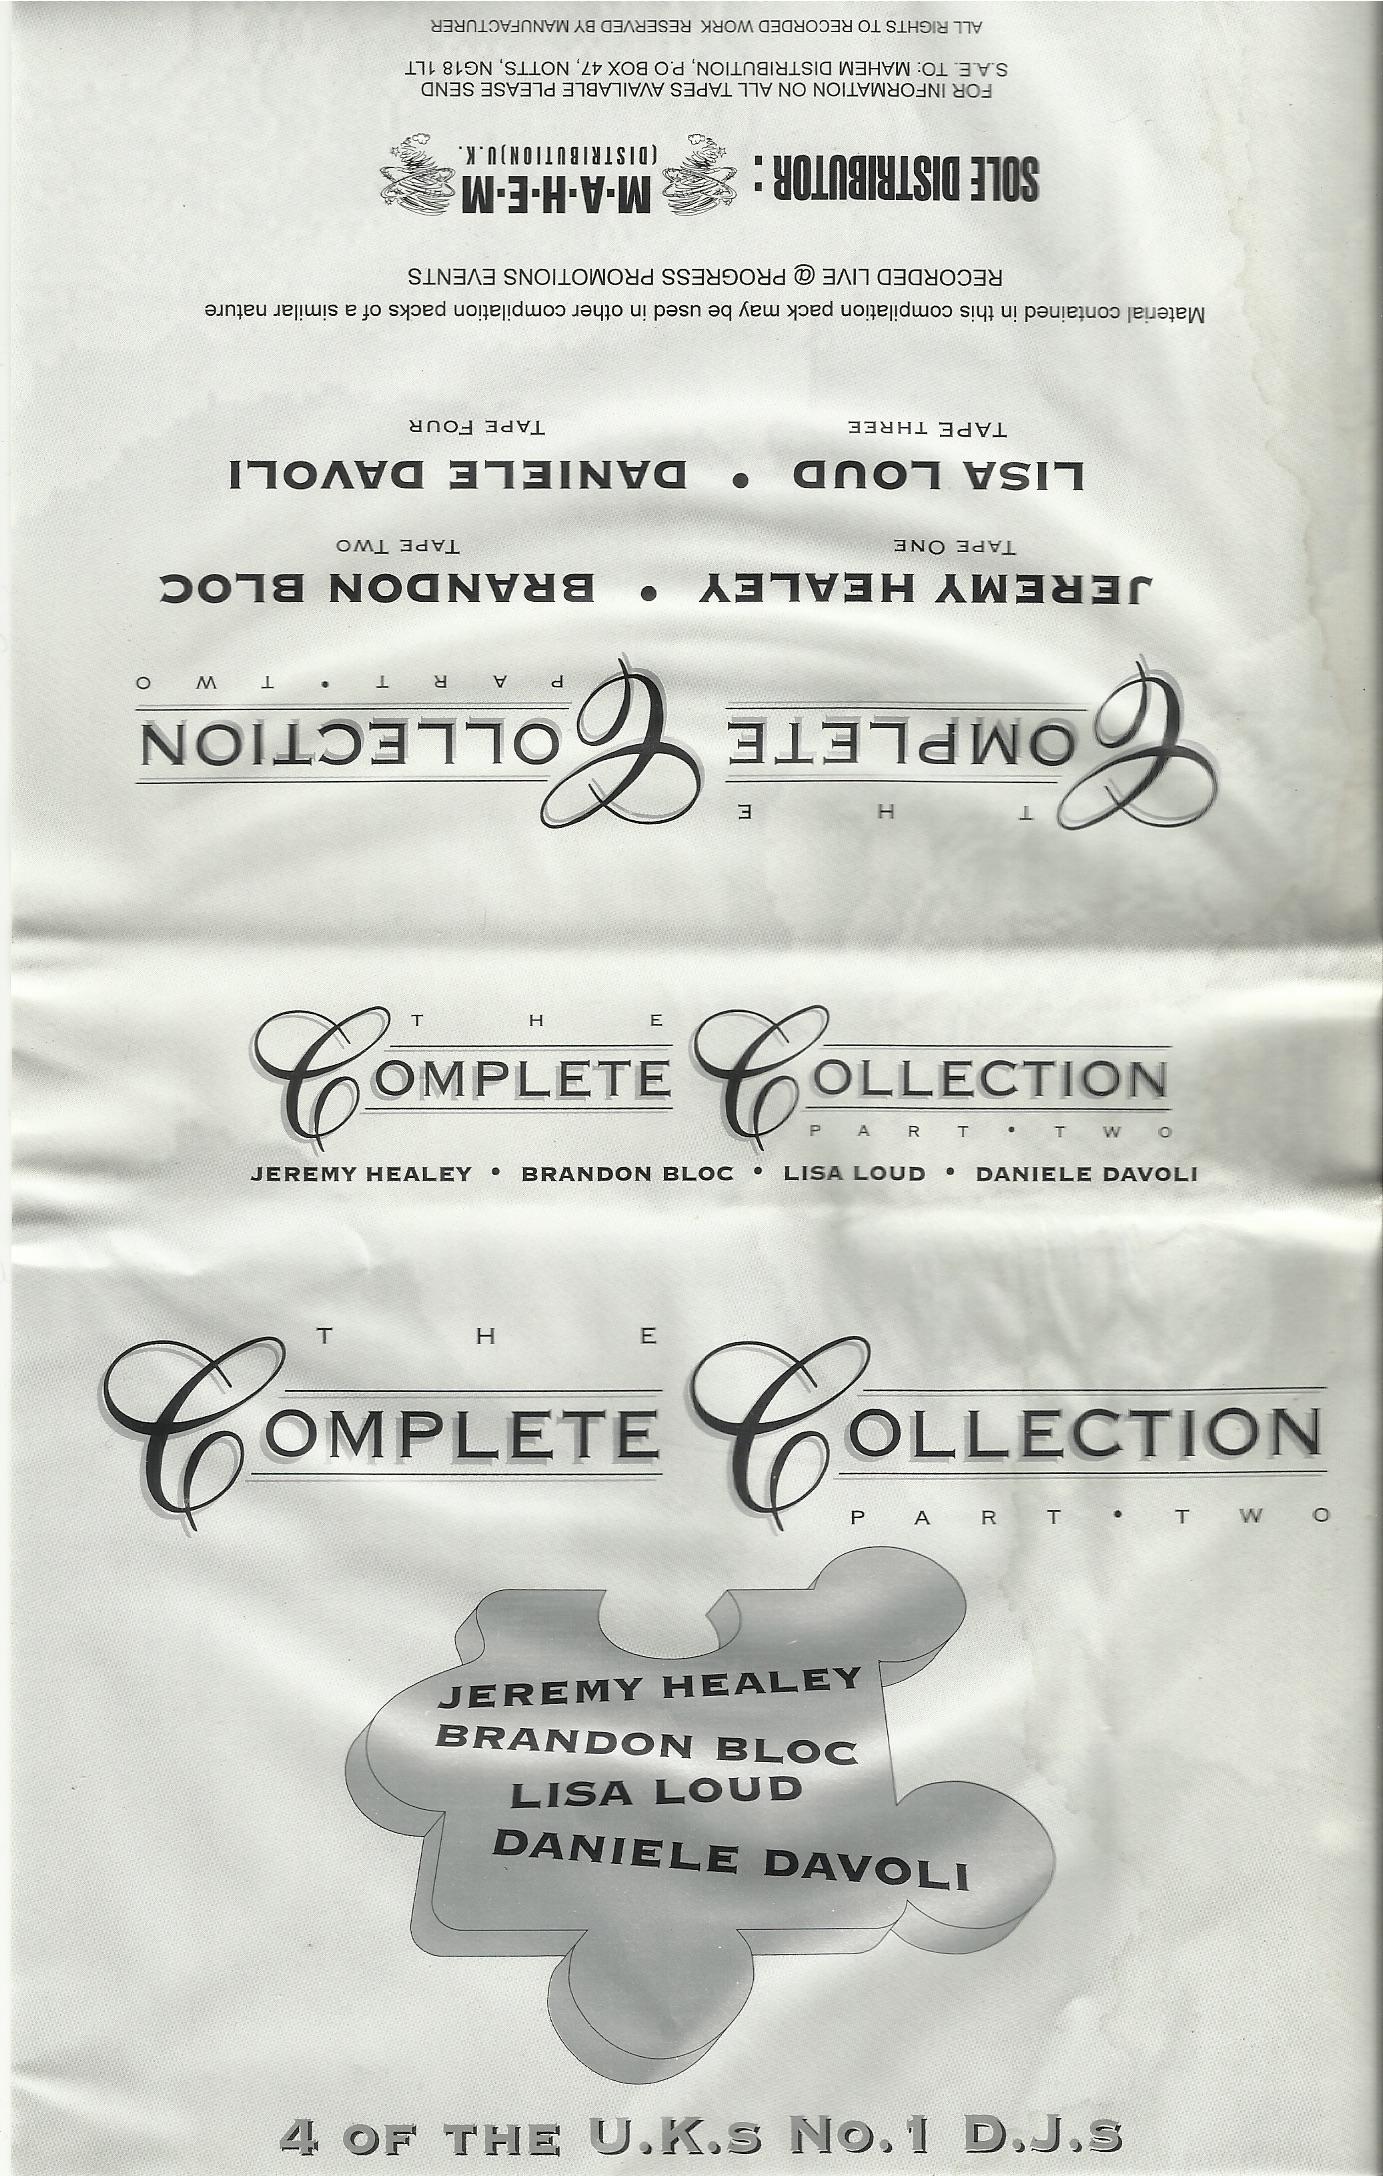 Brandon Block The Complete Collection Pt.2 copy.jpg